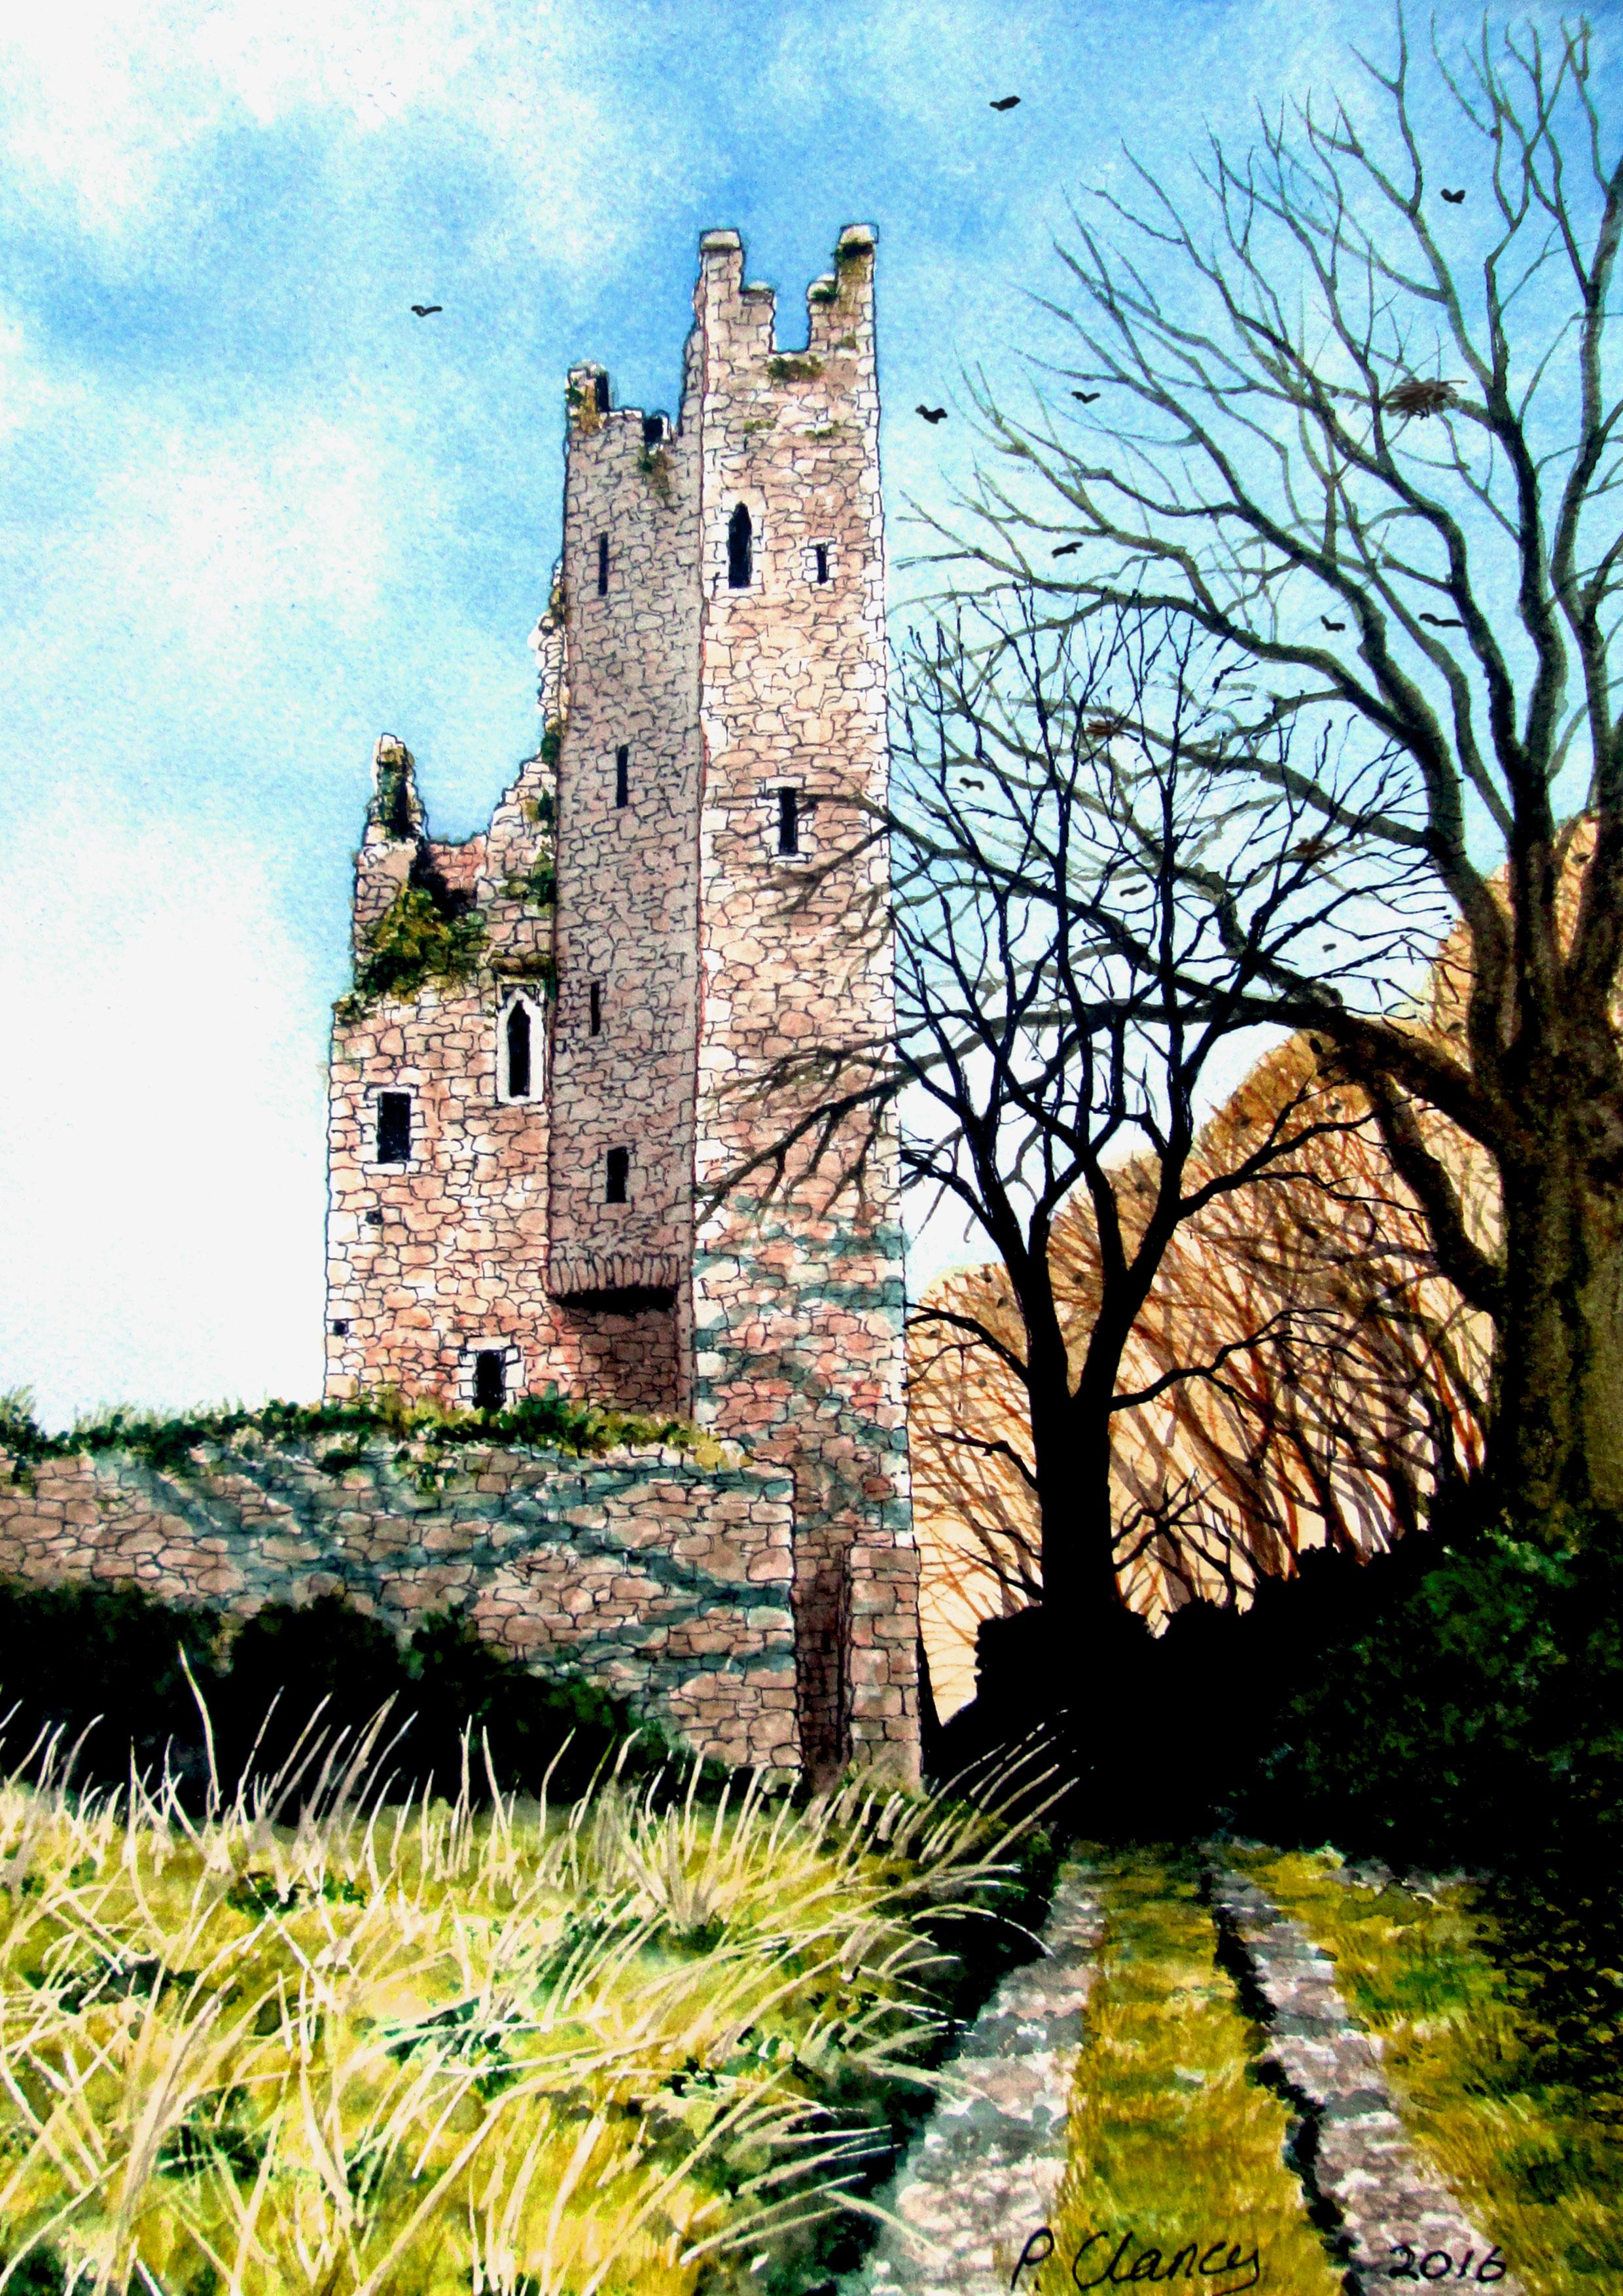 Ballingarry castle